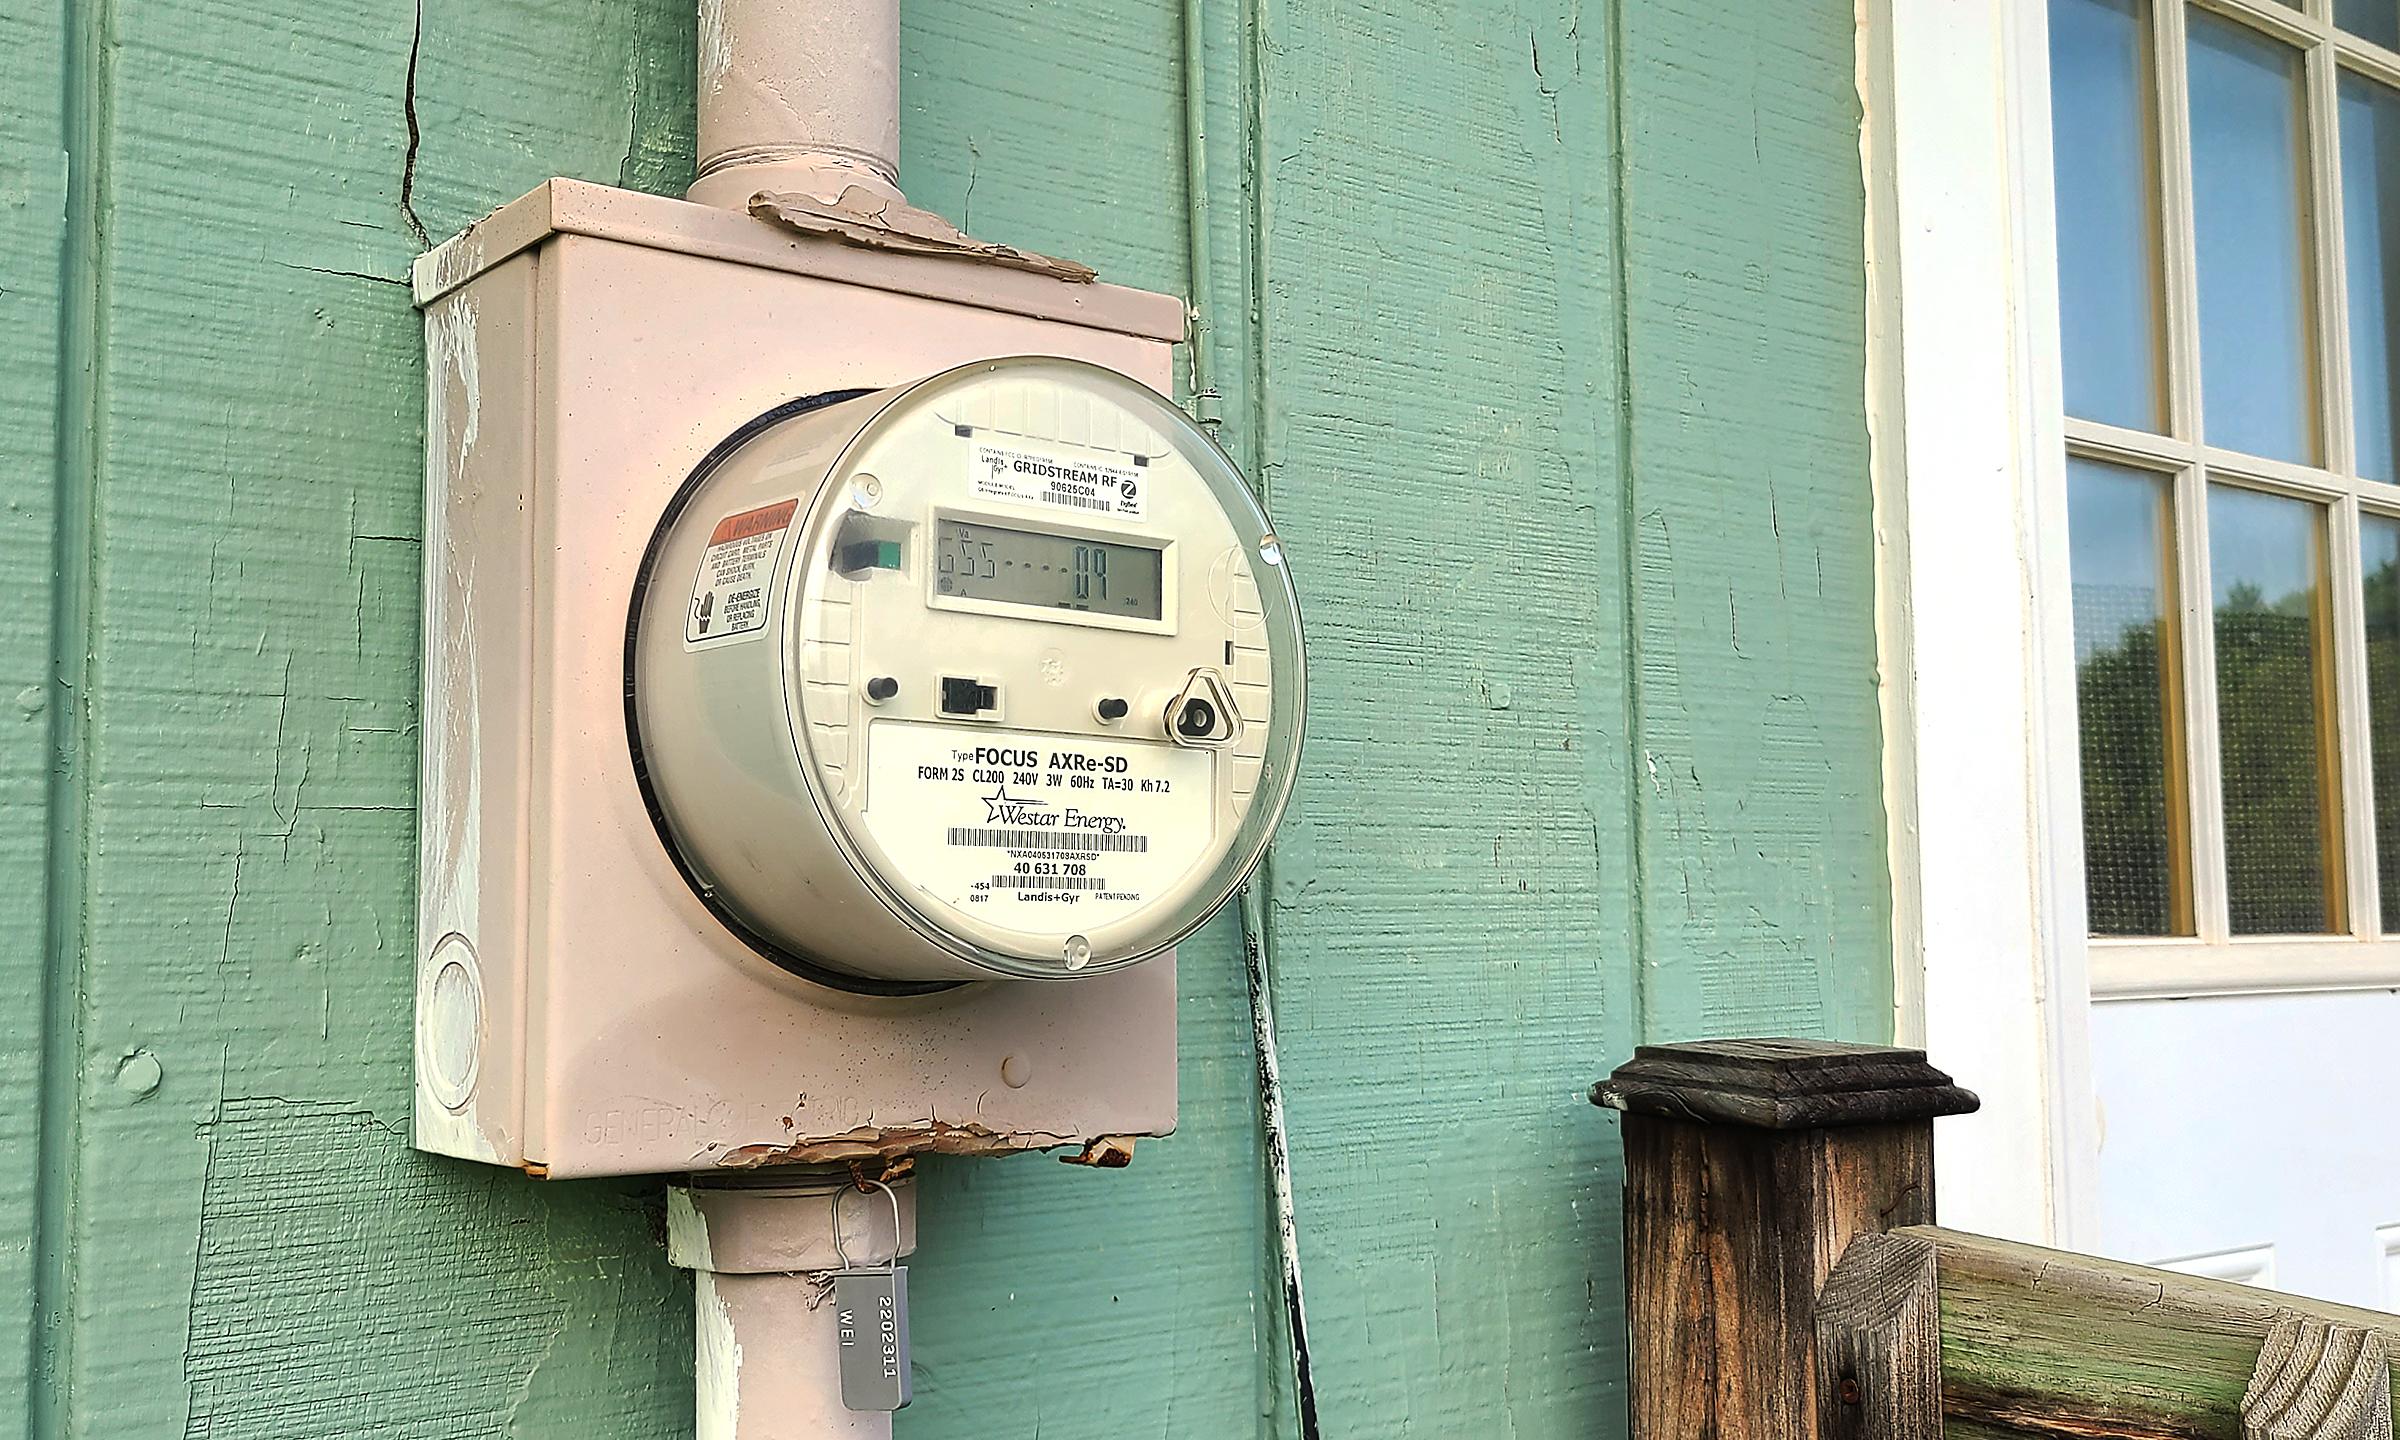 Fuel shortages drove February blackouts, Southwest Power Pool investigators find